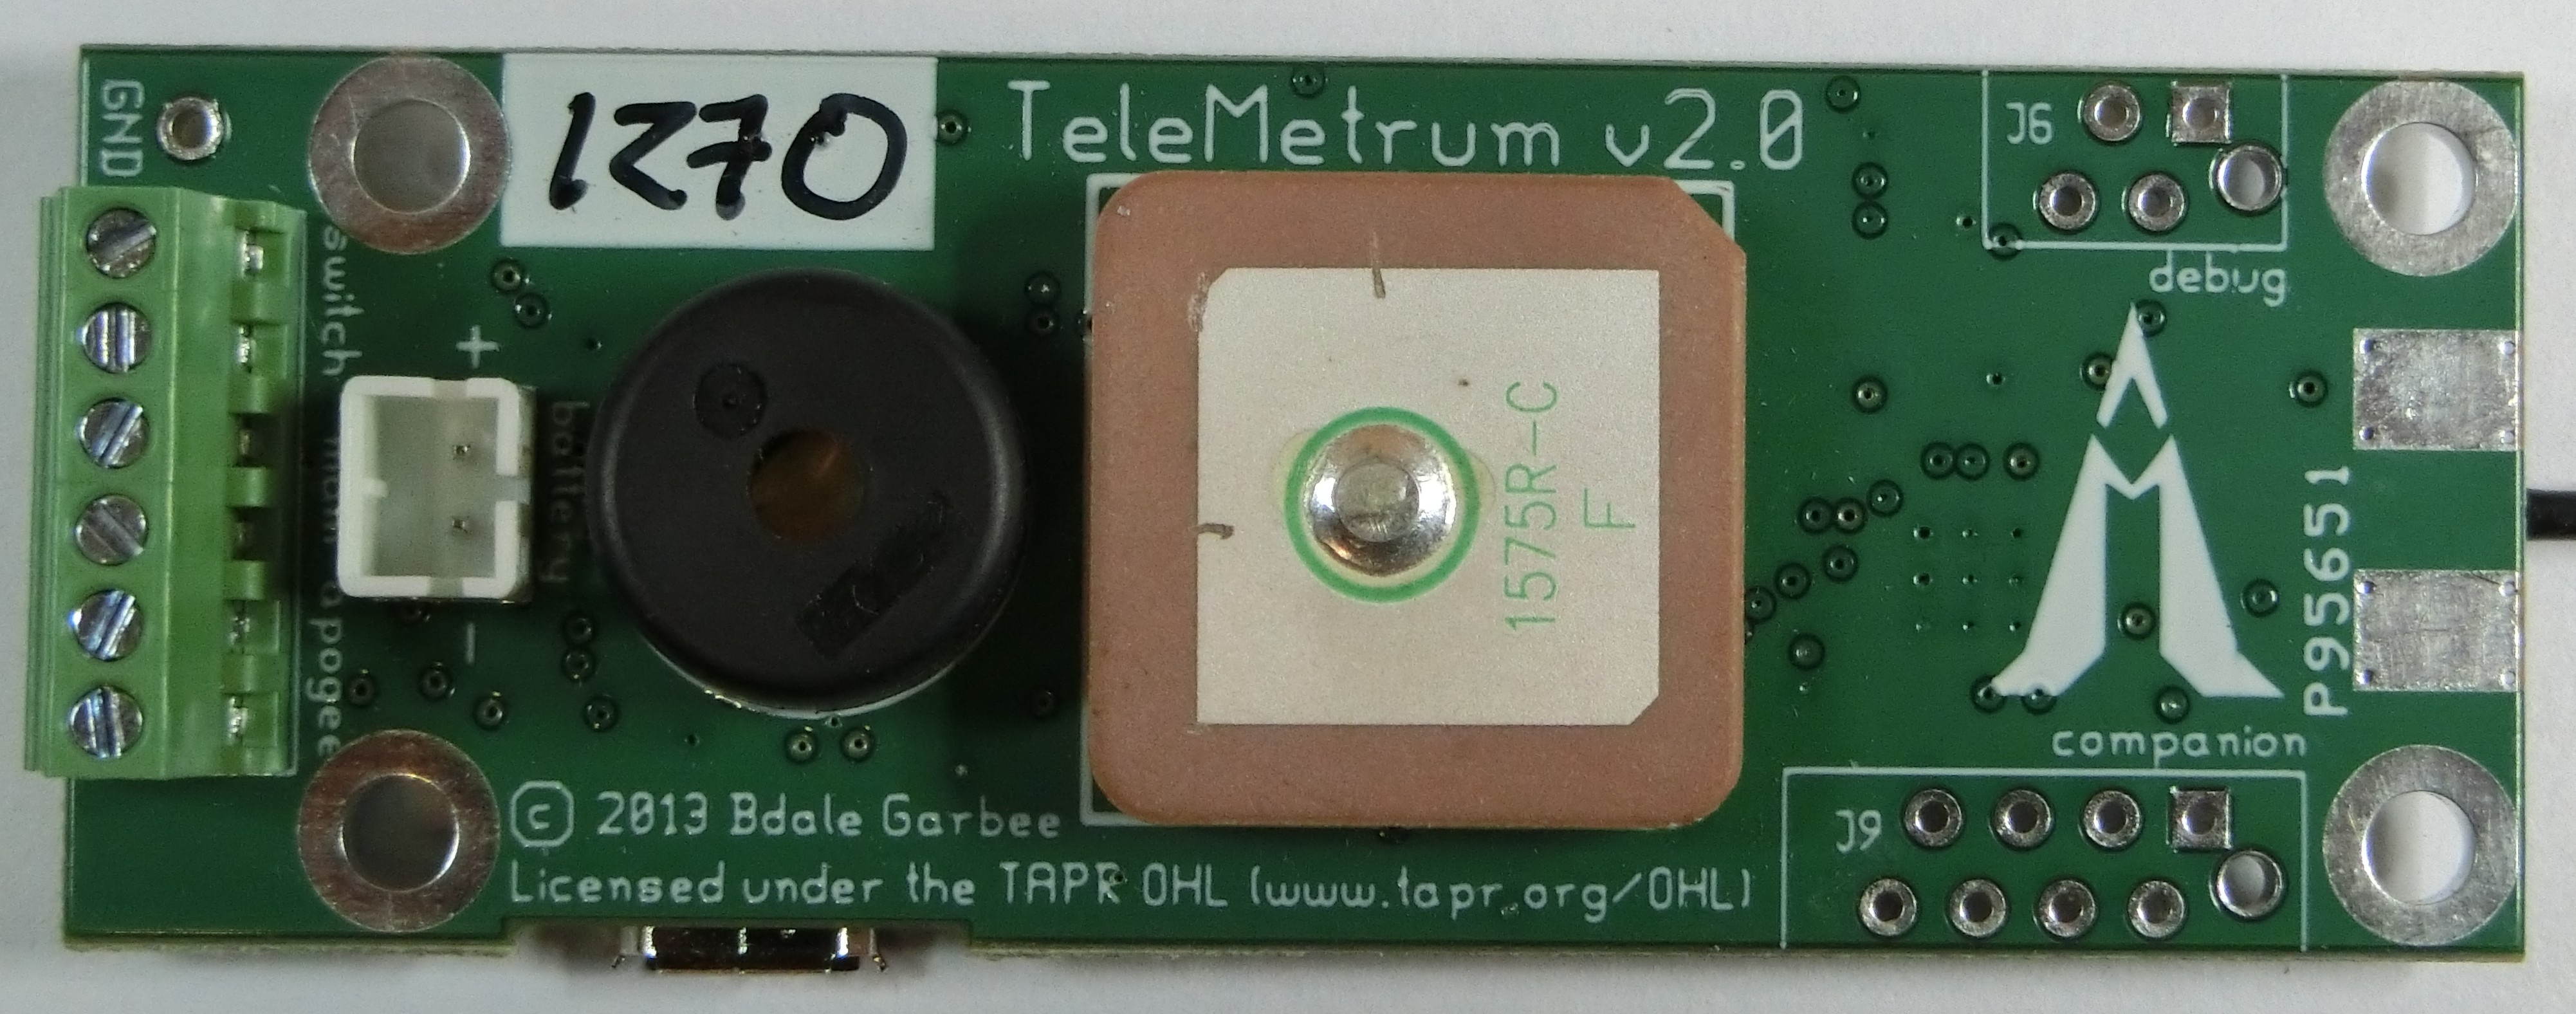 TeleMetrum v2.0